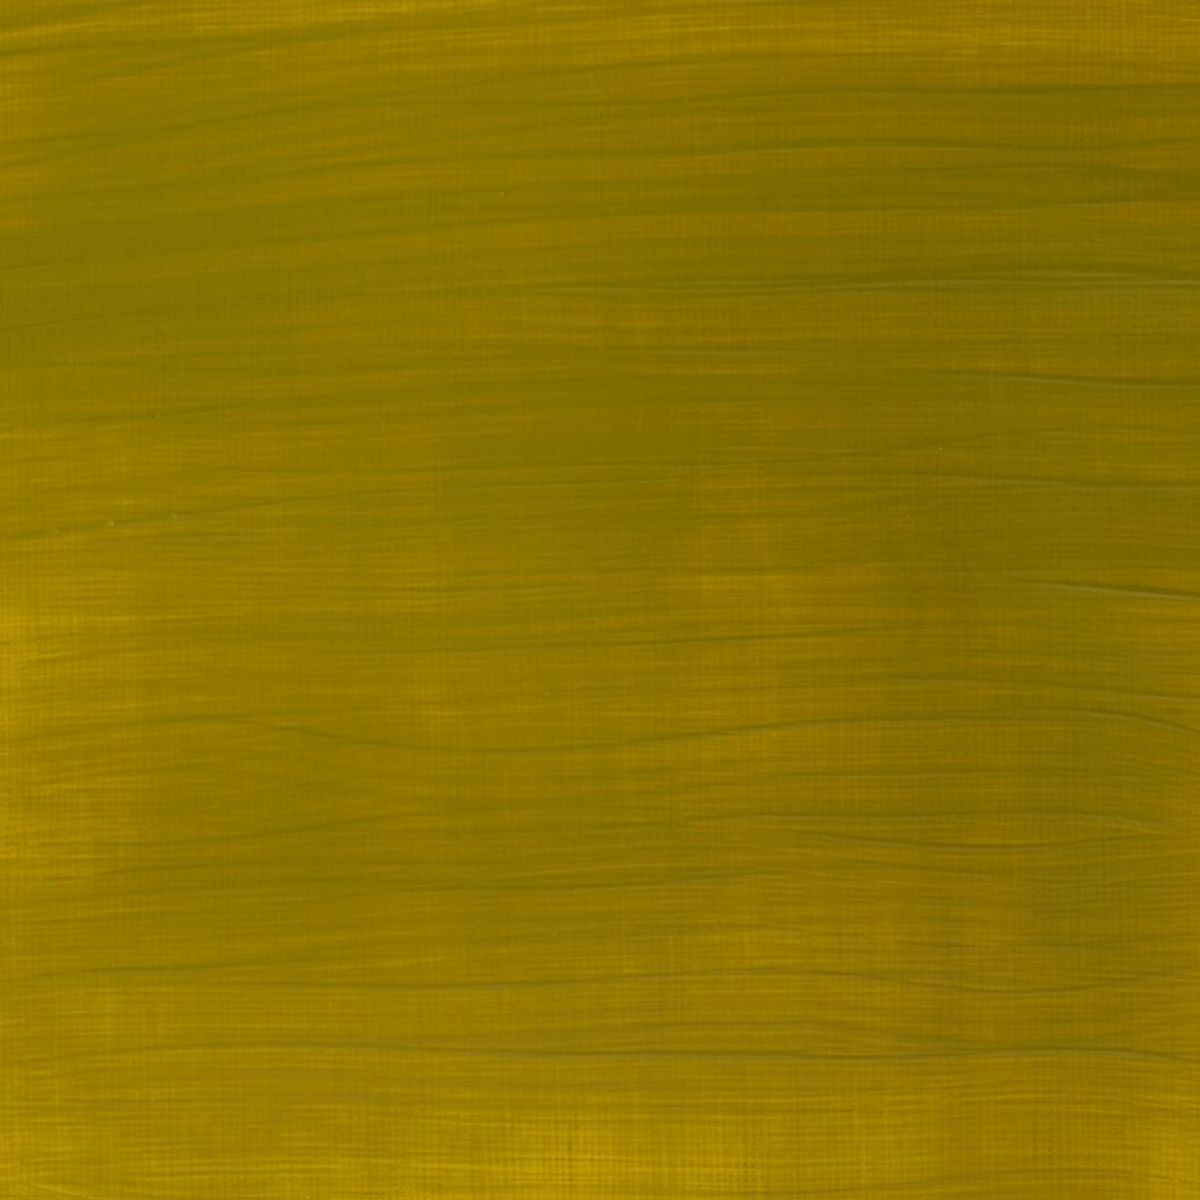 WINSOR AND NEWTON GALERIA ACRYLIC COLOUR - TUBE OF 60 ML - GREEN GOLD (294)